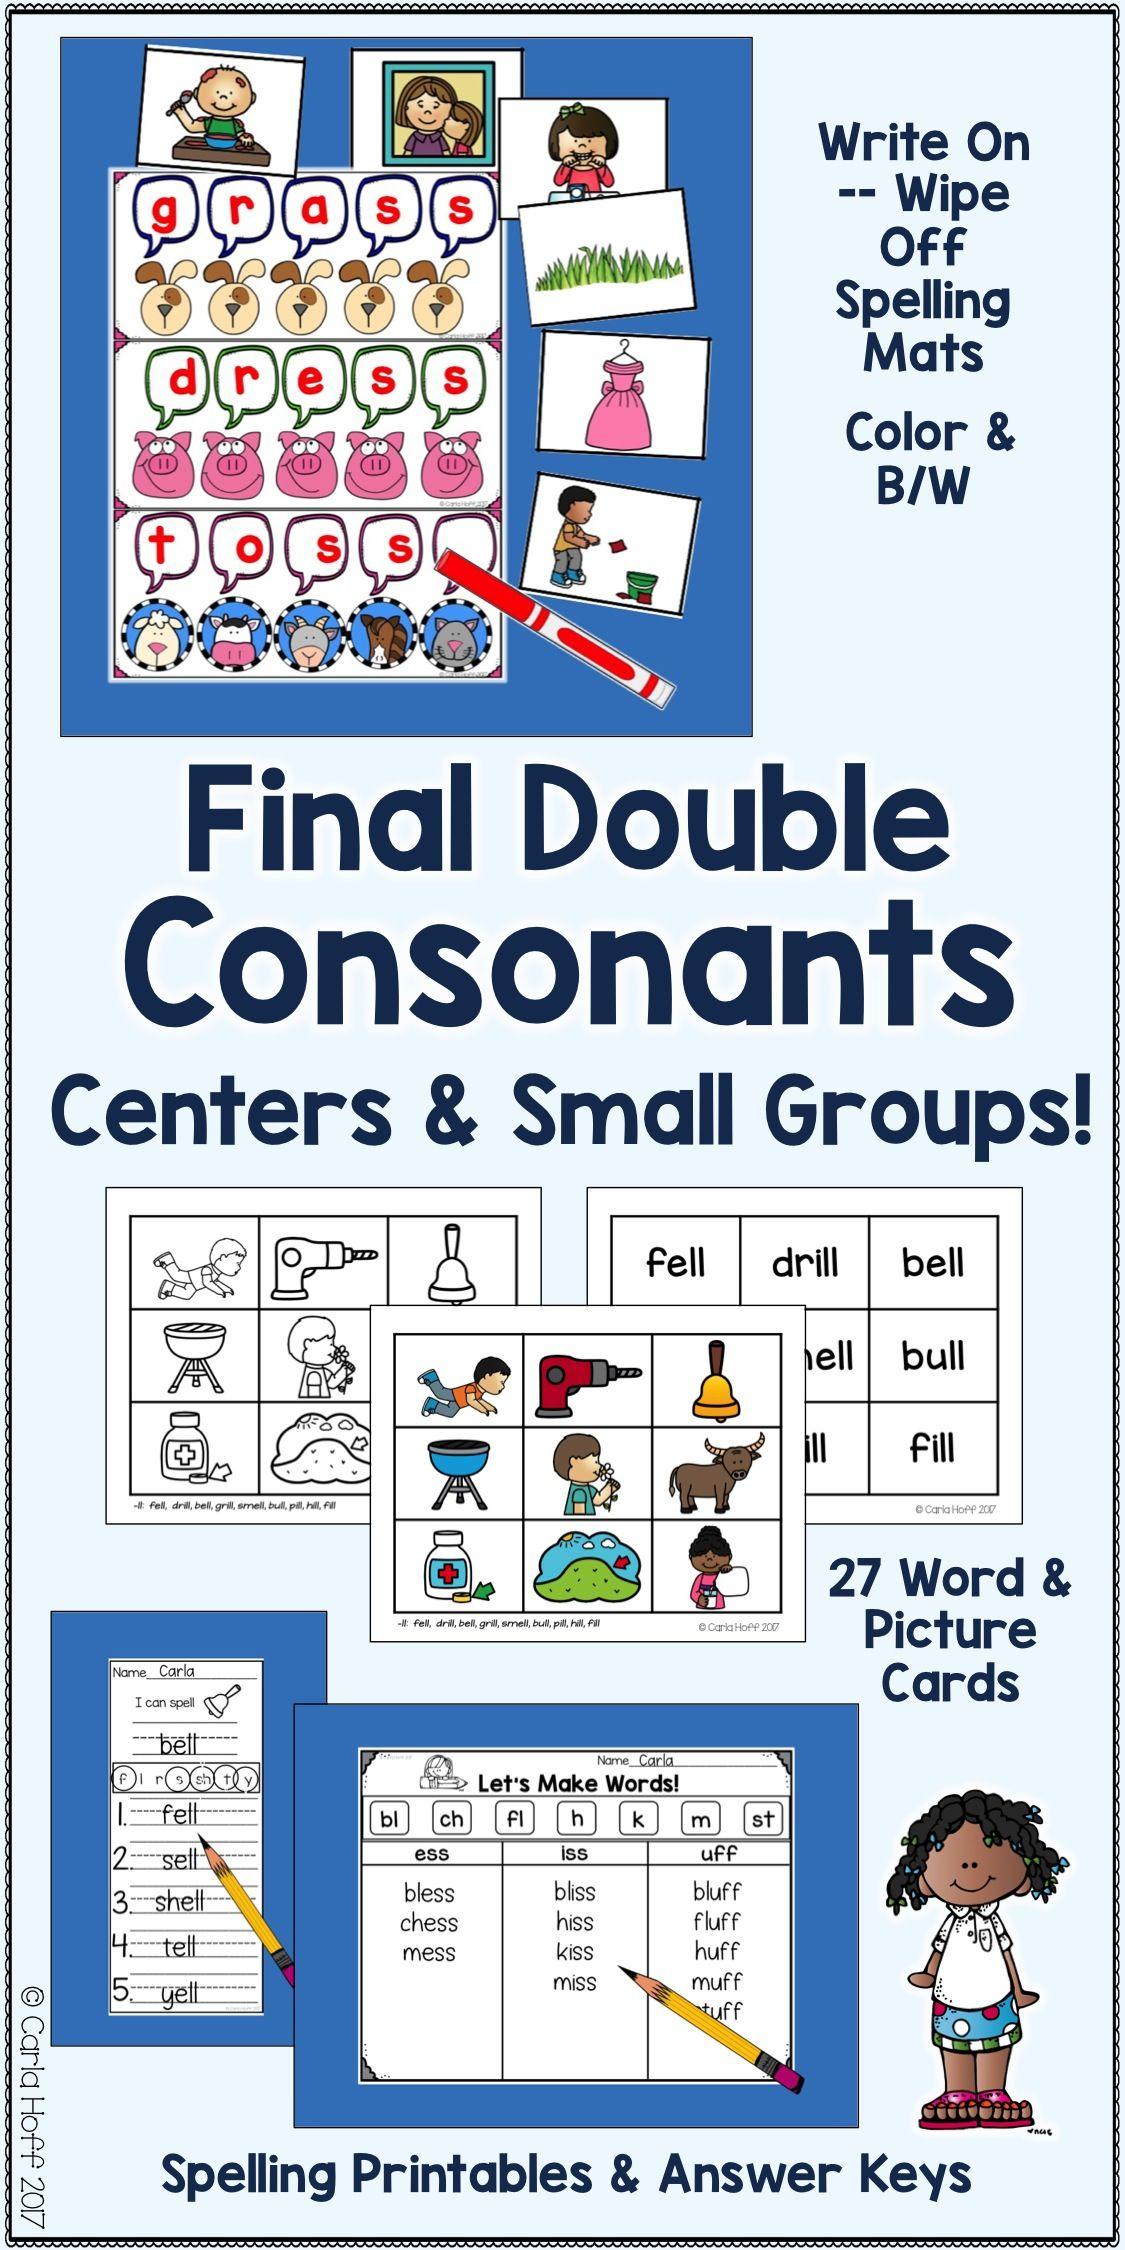 Final Double Consonants